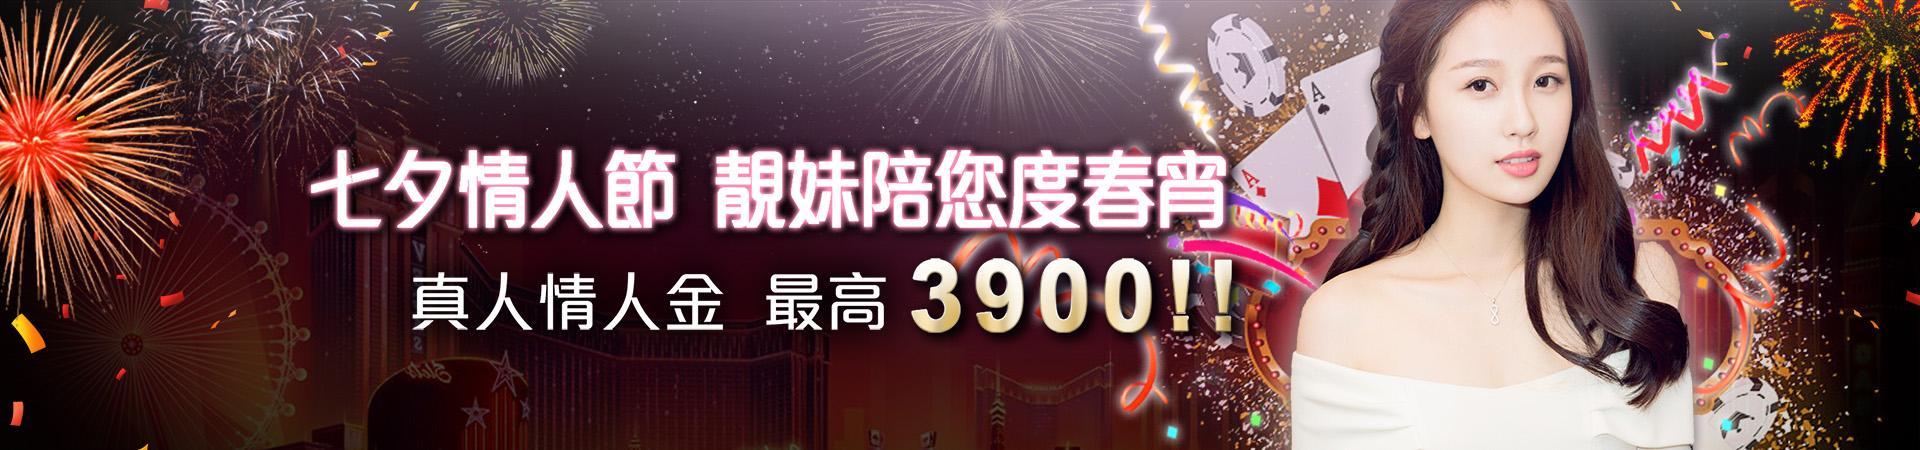 20200814113905A